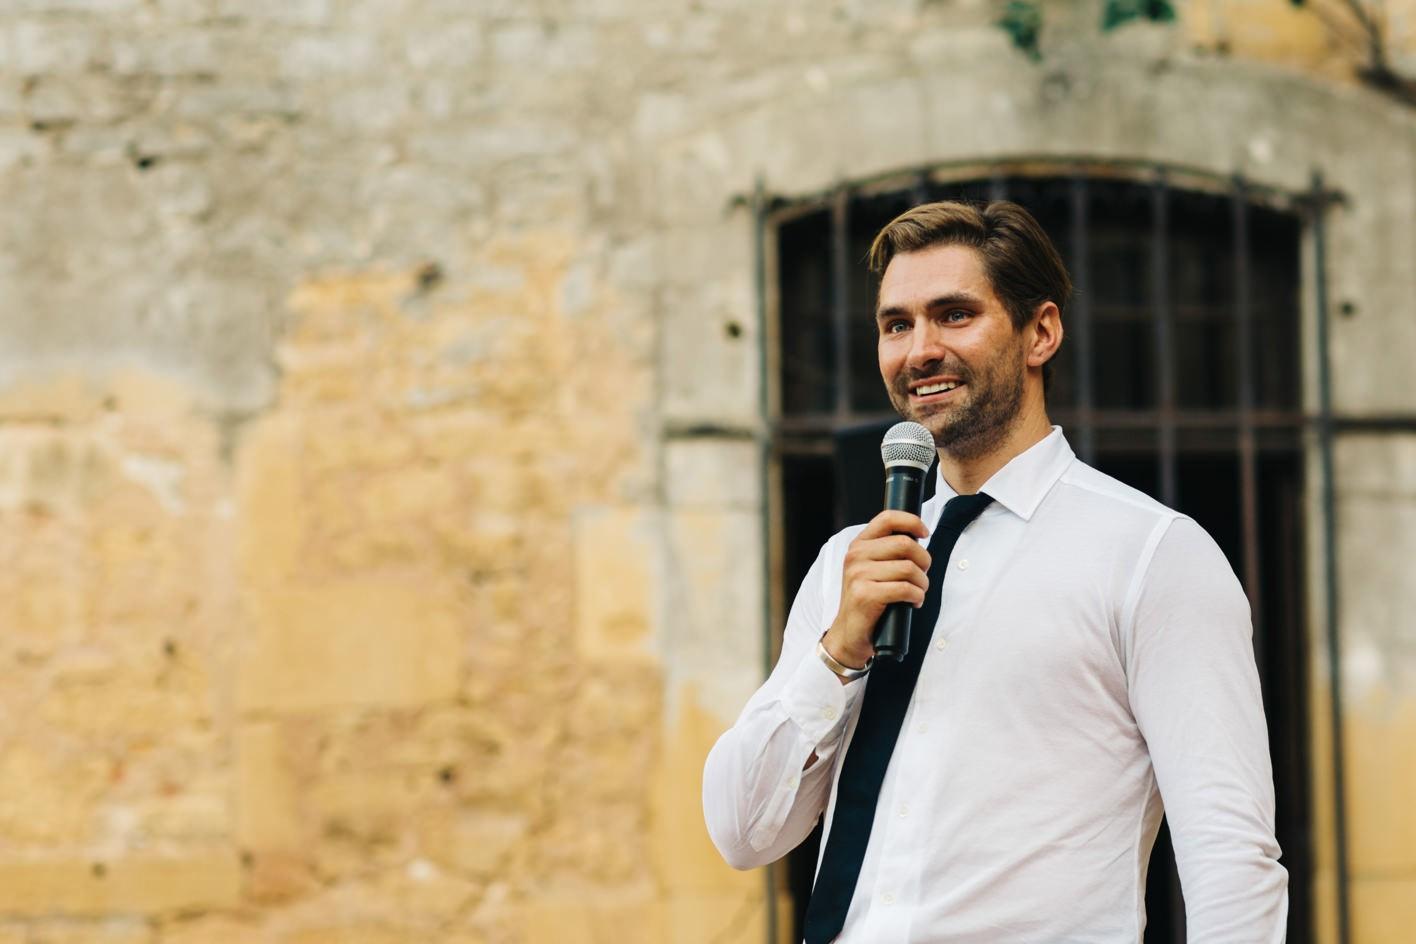 groom with tear in eye during speech